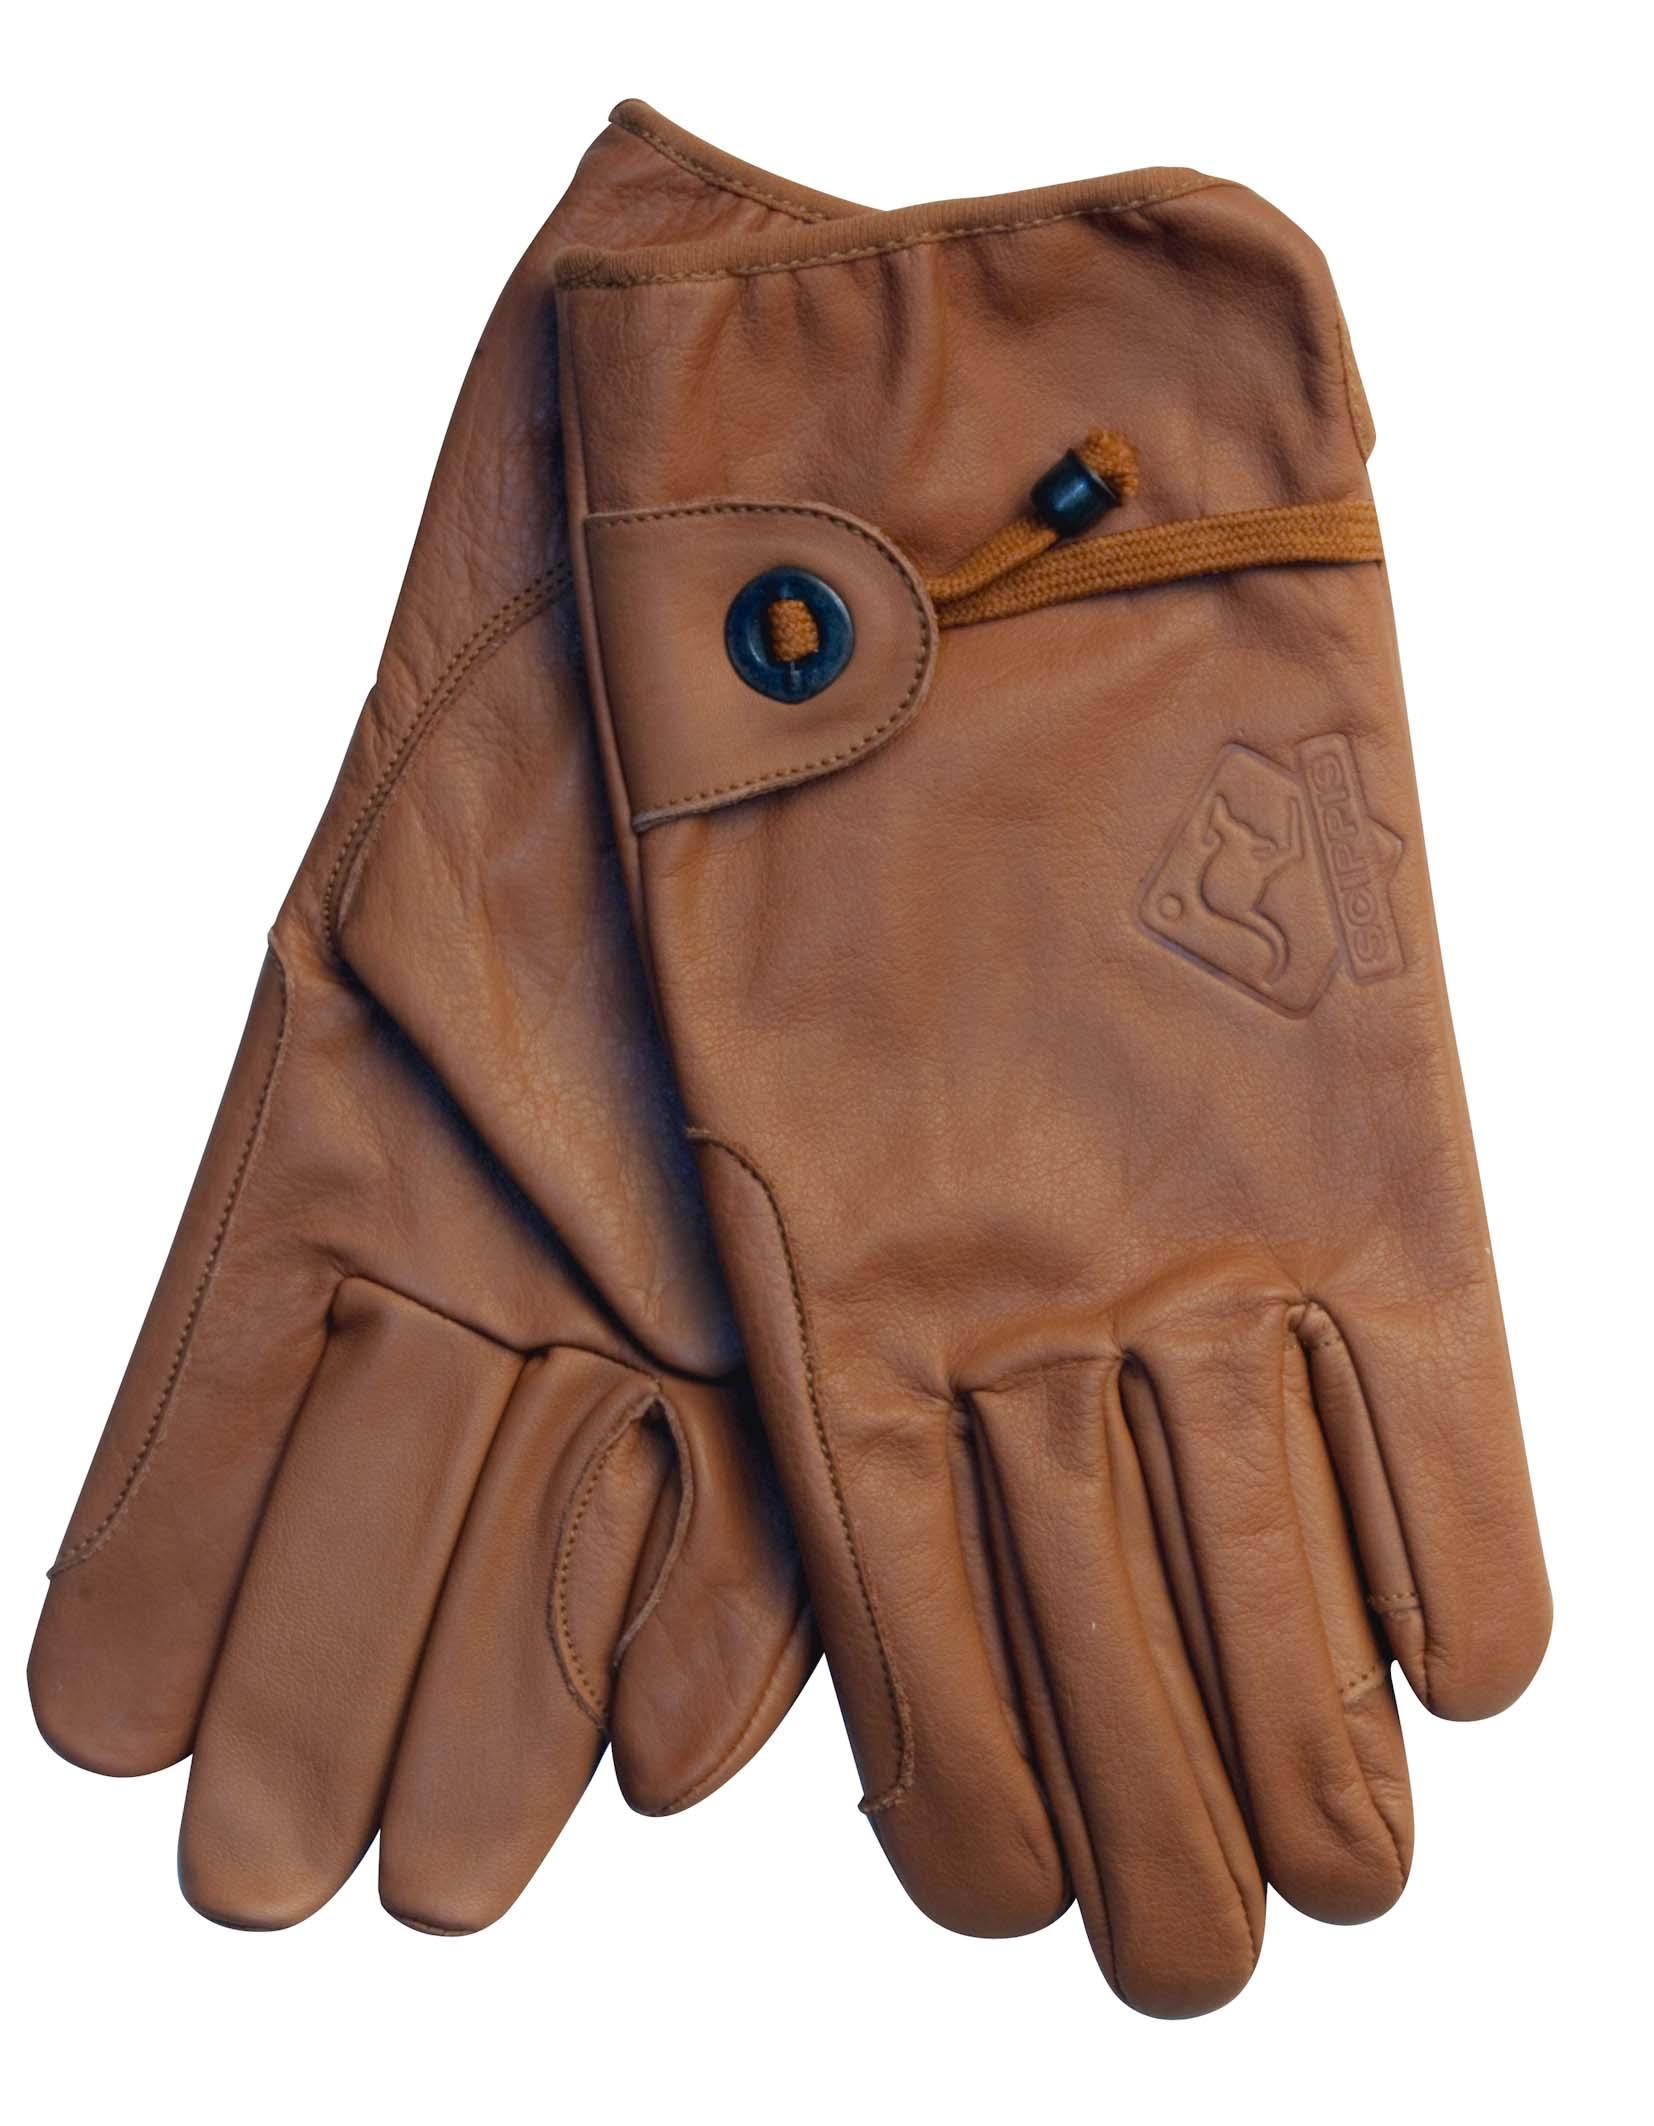 Scippis Leder Handschuhe-Braun-L